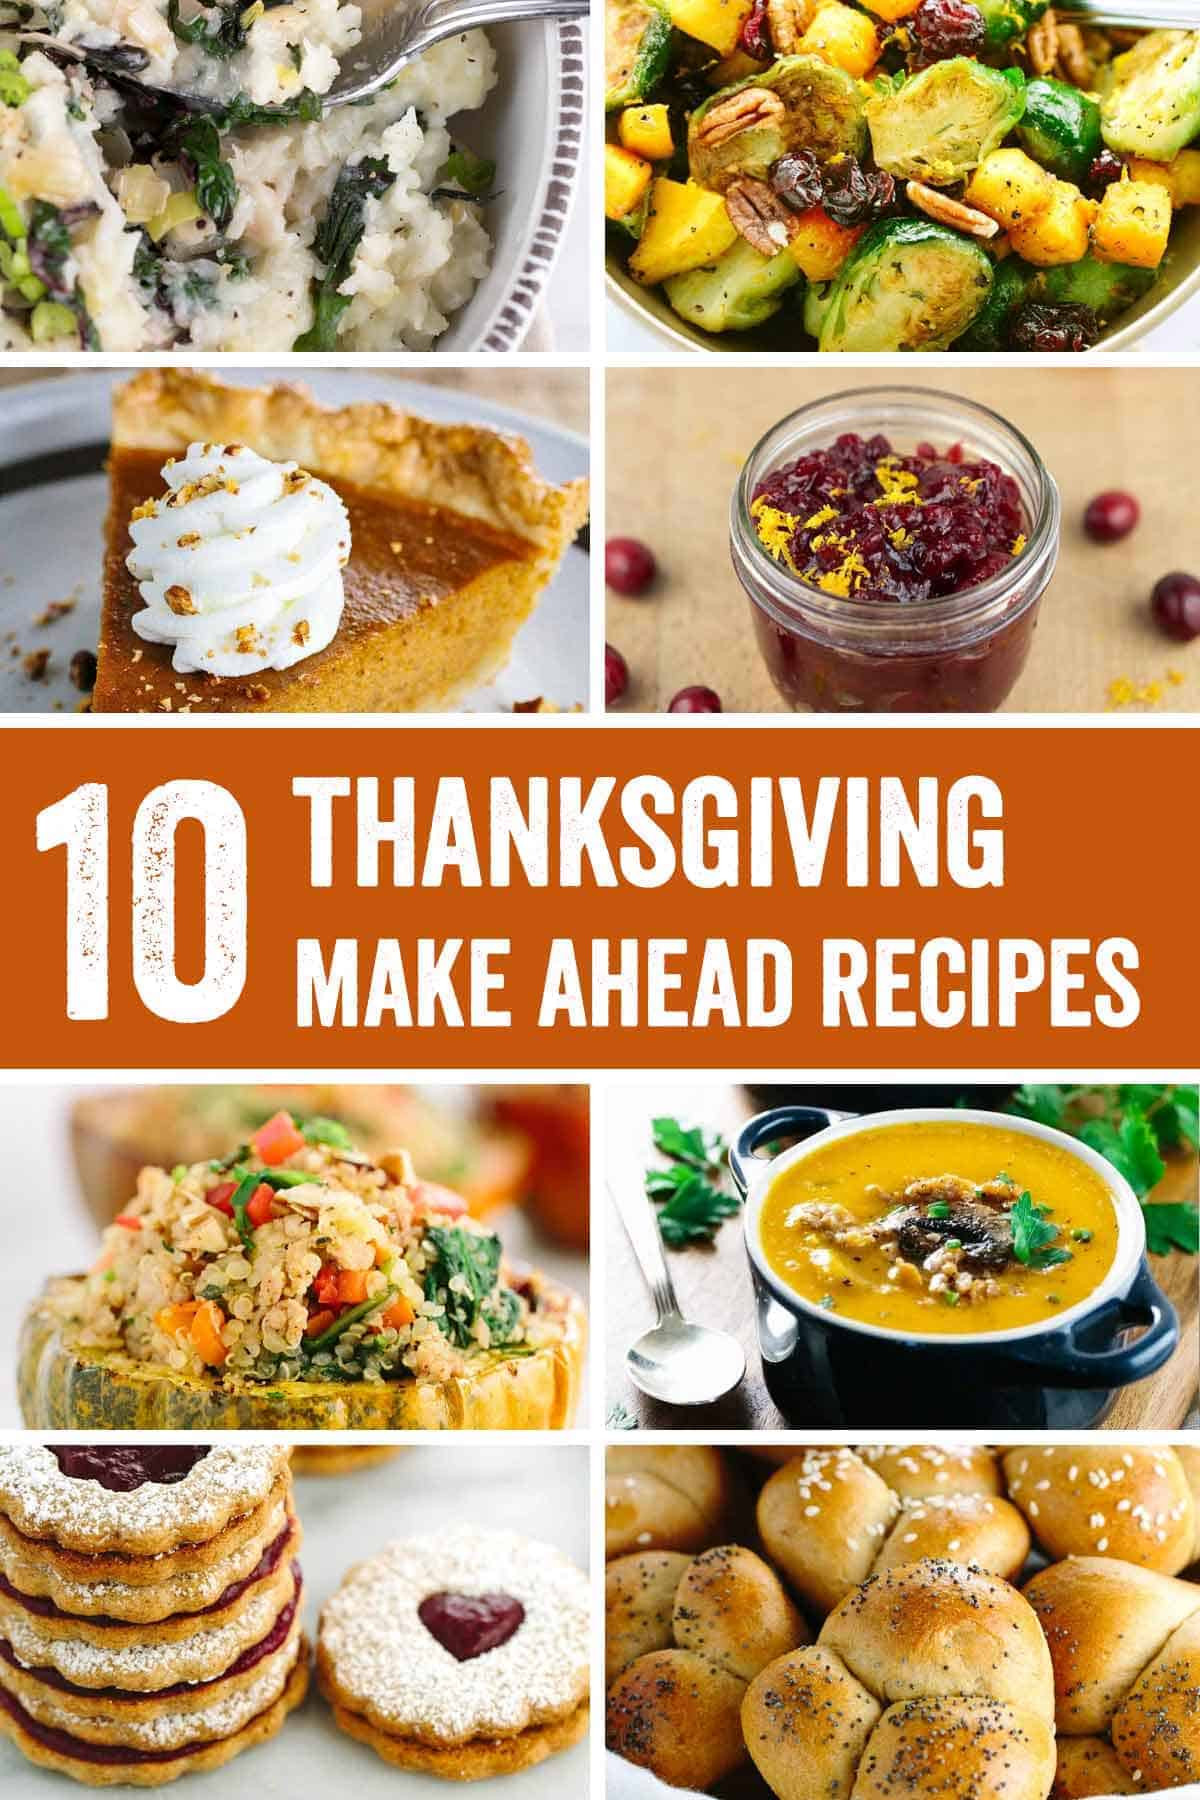 Make Ahead Thanksgiving Turkey  Roundup 10 Thanksgiving Make Ahead Recipes